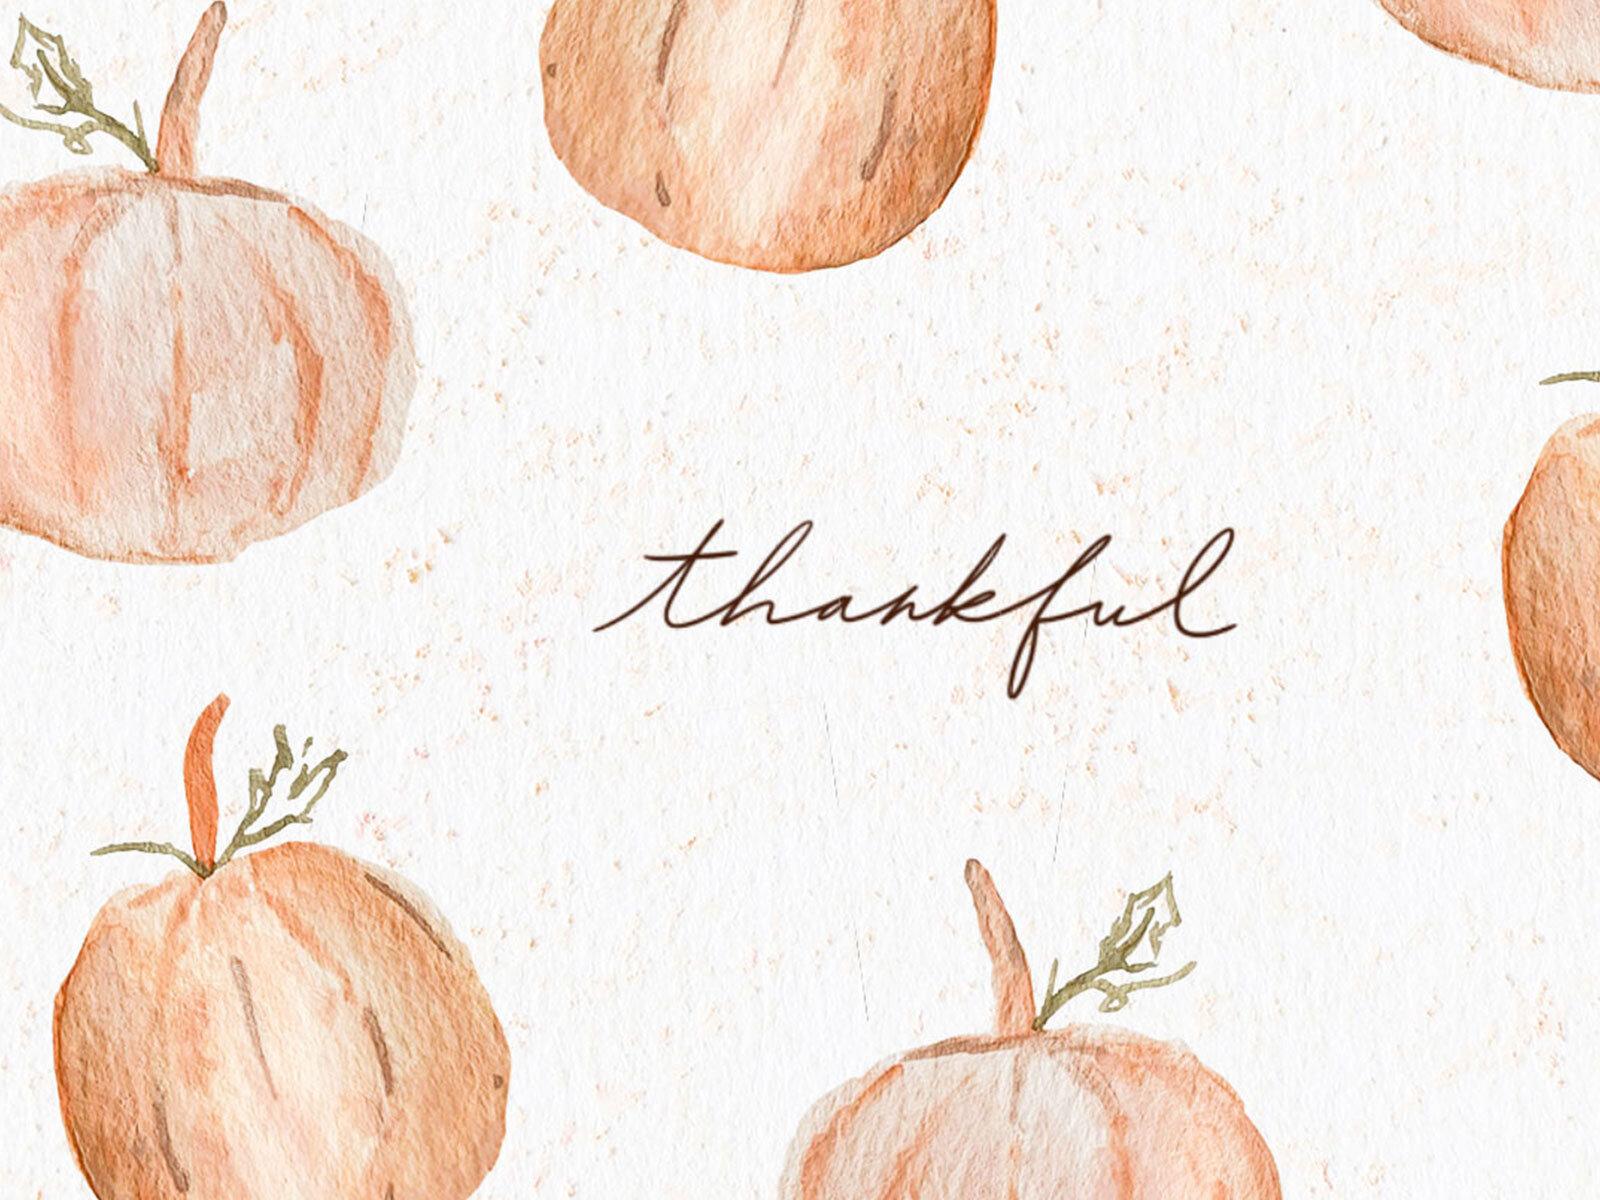 fall backgrounds, fall backgrounds iphone, fall backgrounds wallpaper, fall backgrounds iphone autumn, watercolor paintings pumpkins, watercolor pumpkins autumn